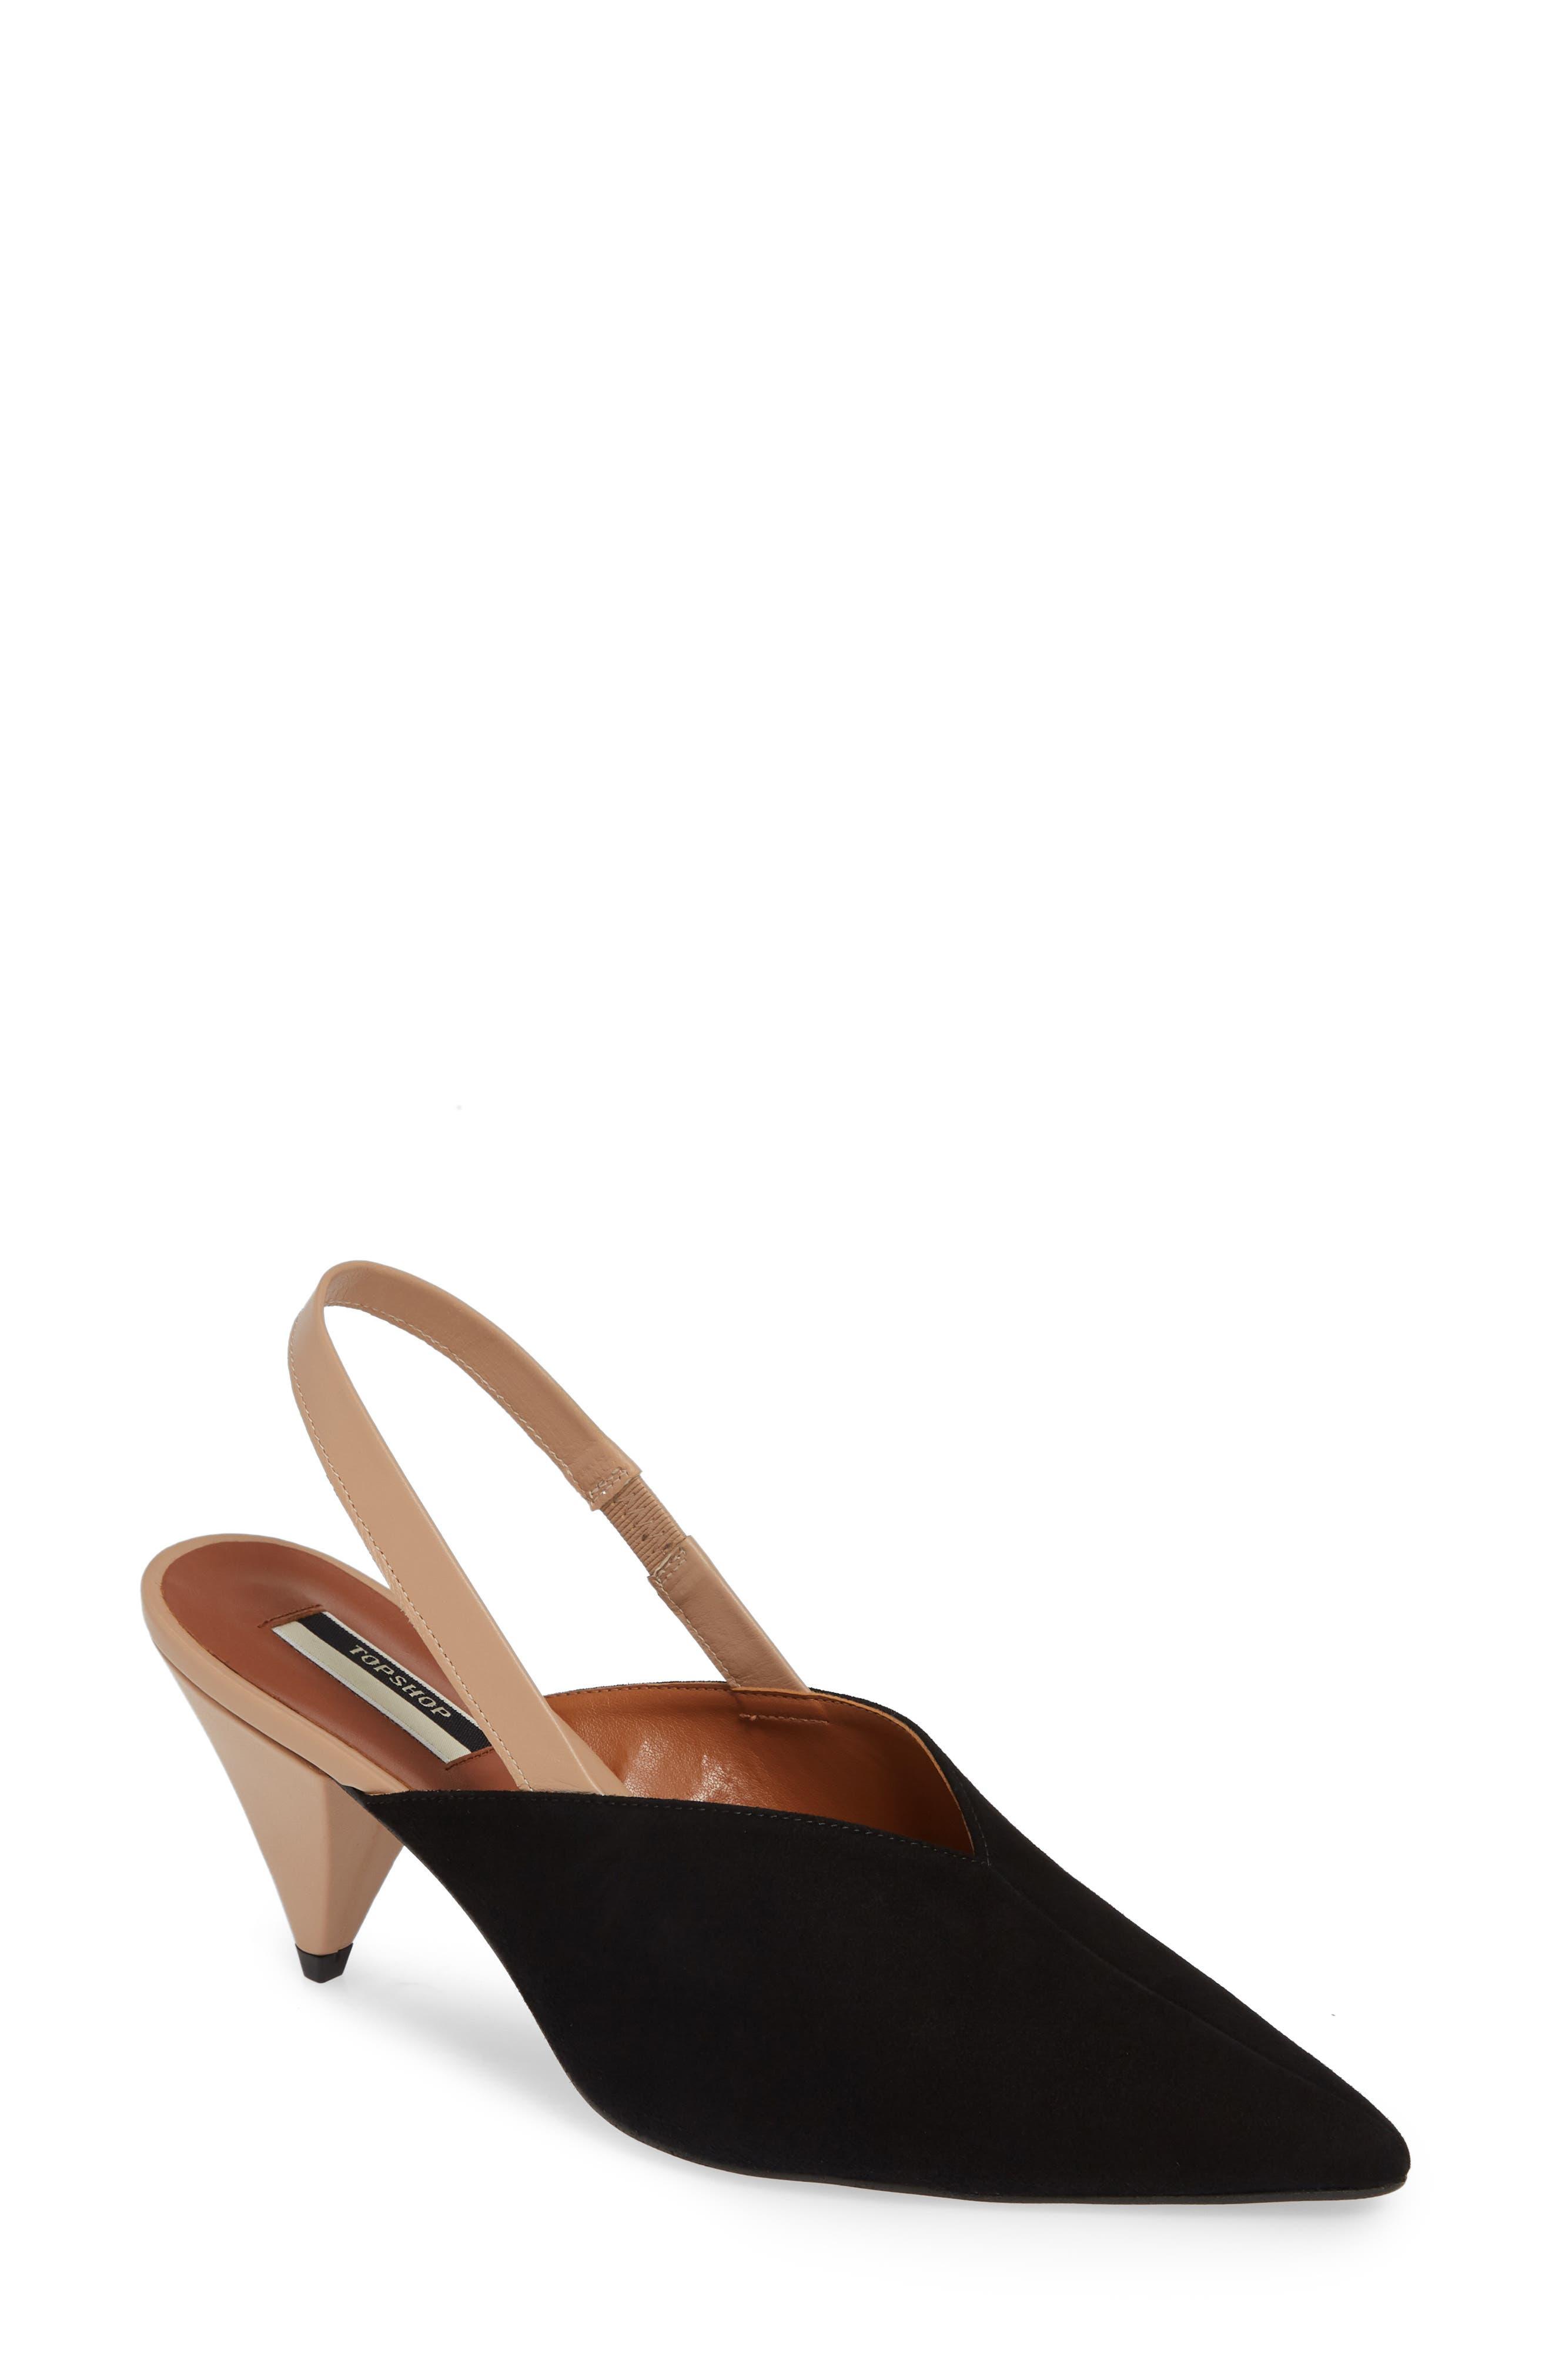 2f62c0a522b Topshop Women s Pumps Shoes